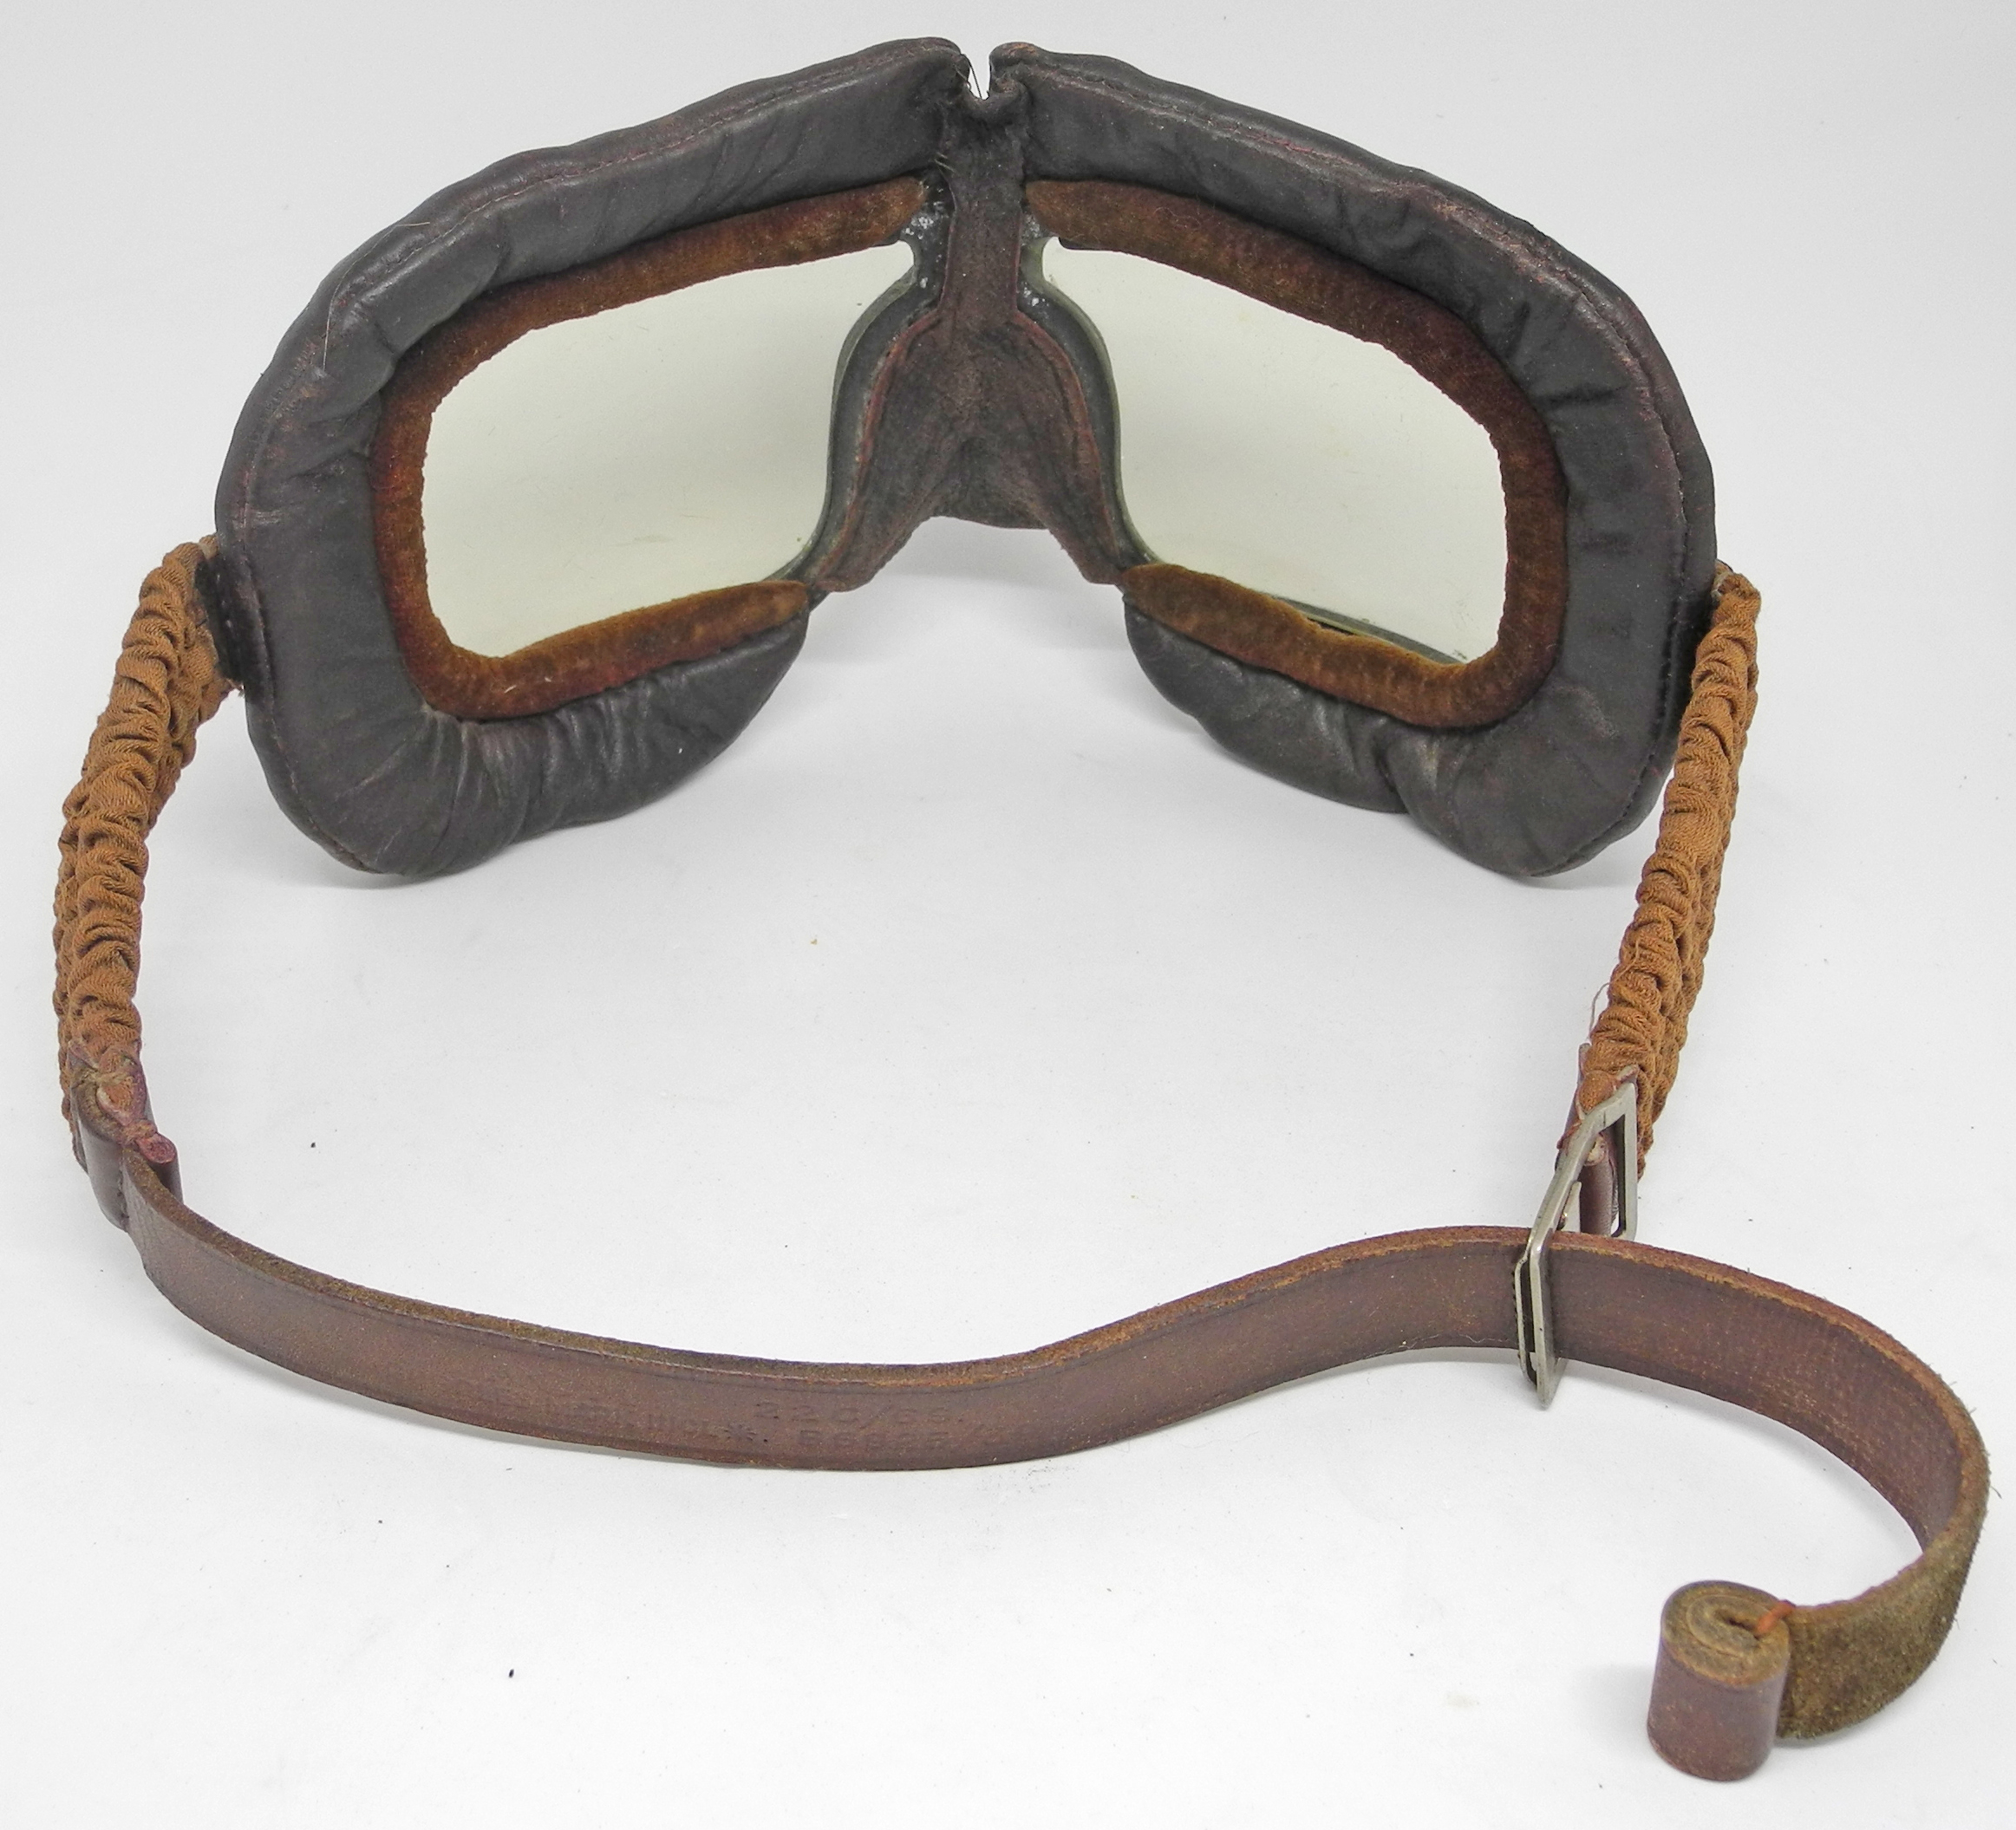 RAF Mk III flying goggles